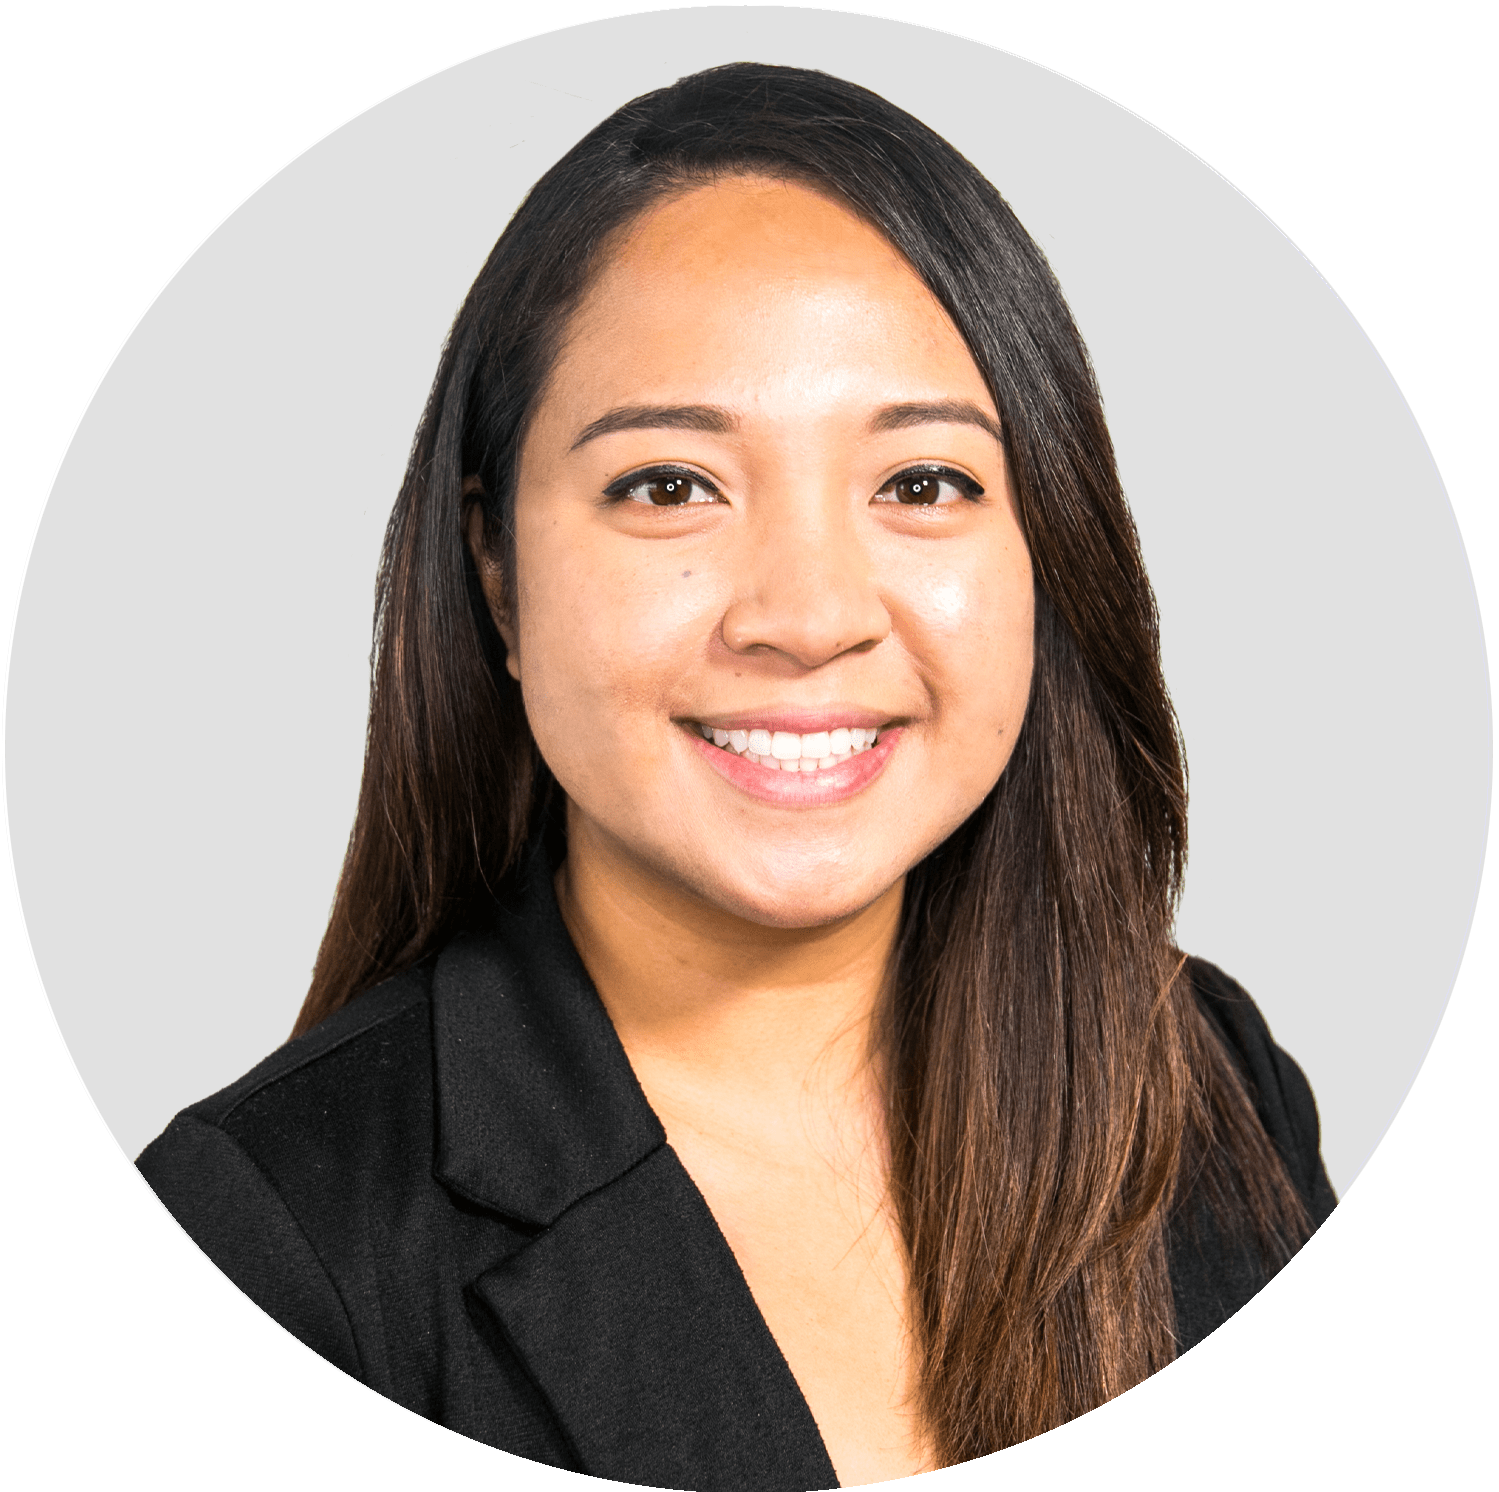 A Staff Photo of Accountant Carla